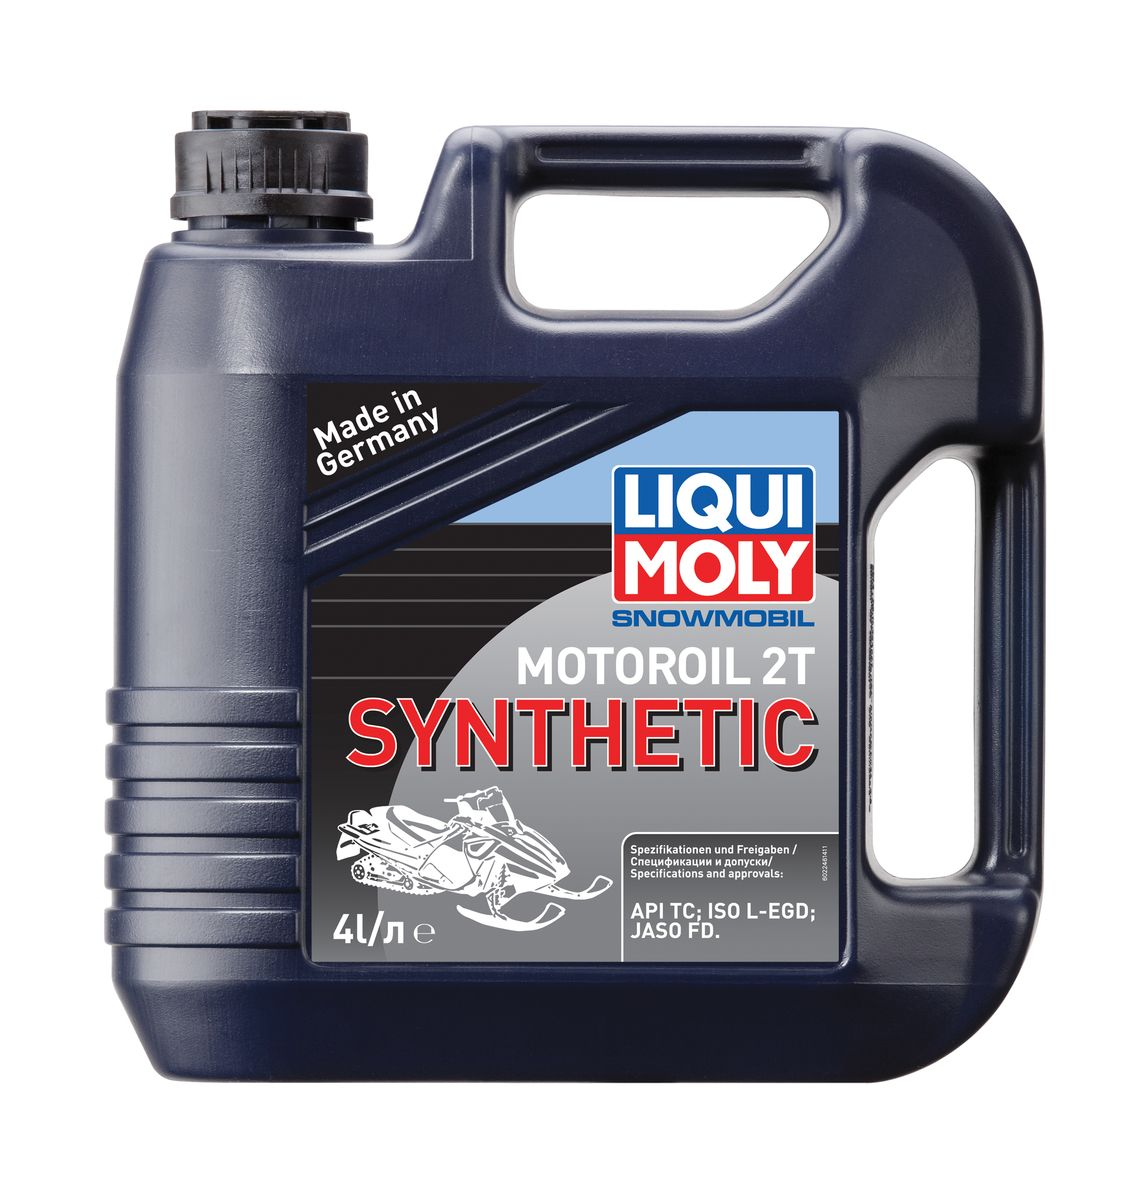 "Масло моторное Liqui Moly ""Snowmobil Motoroil 2T Synthetic"", синтетическое, 4 л"